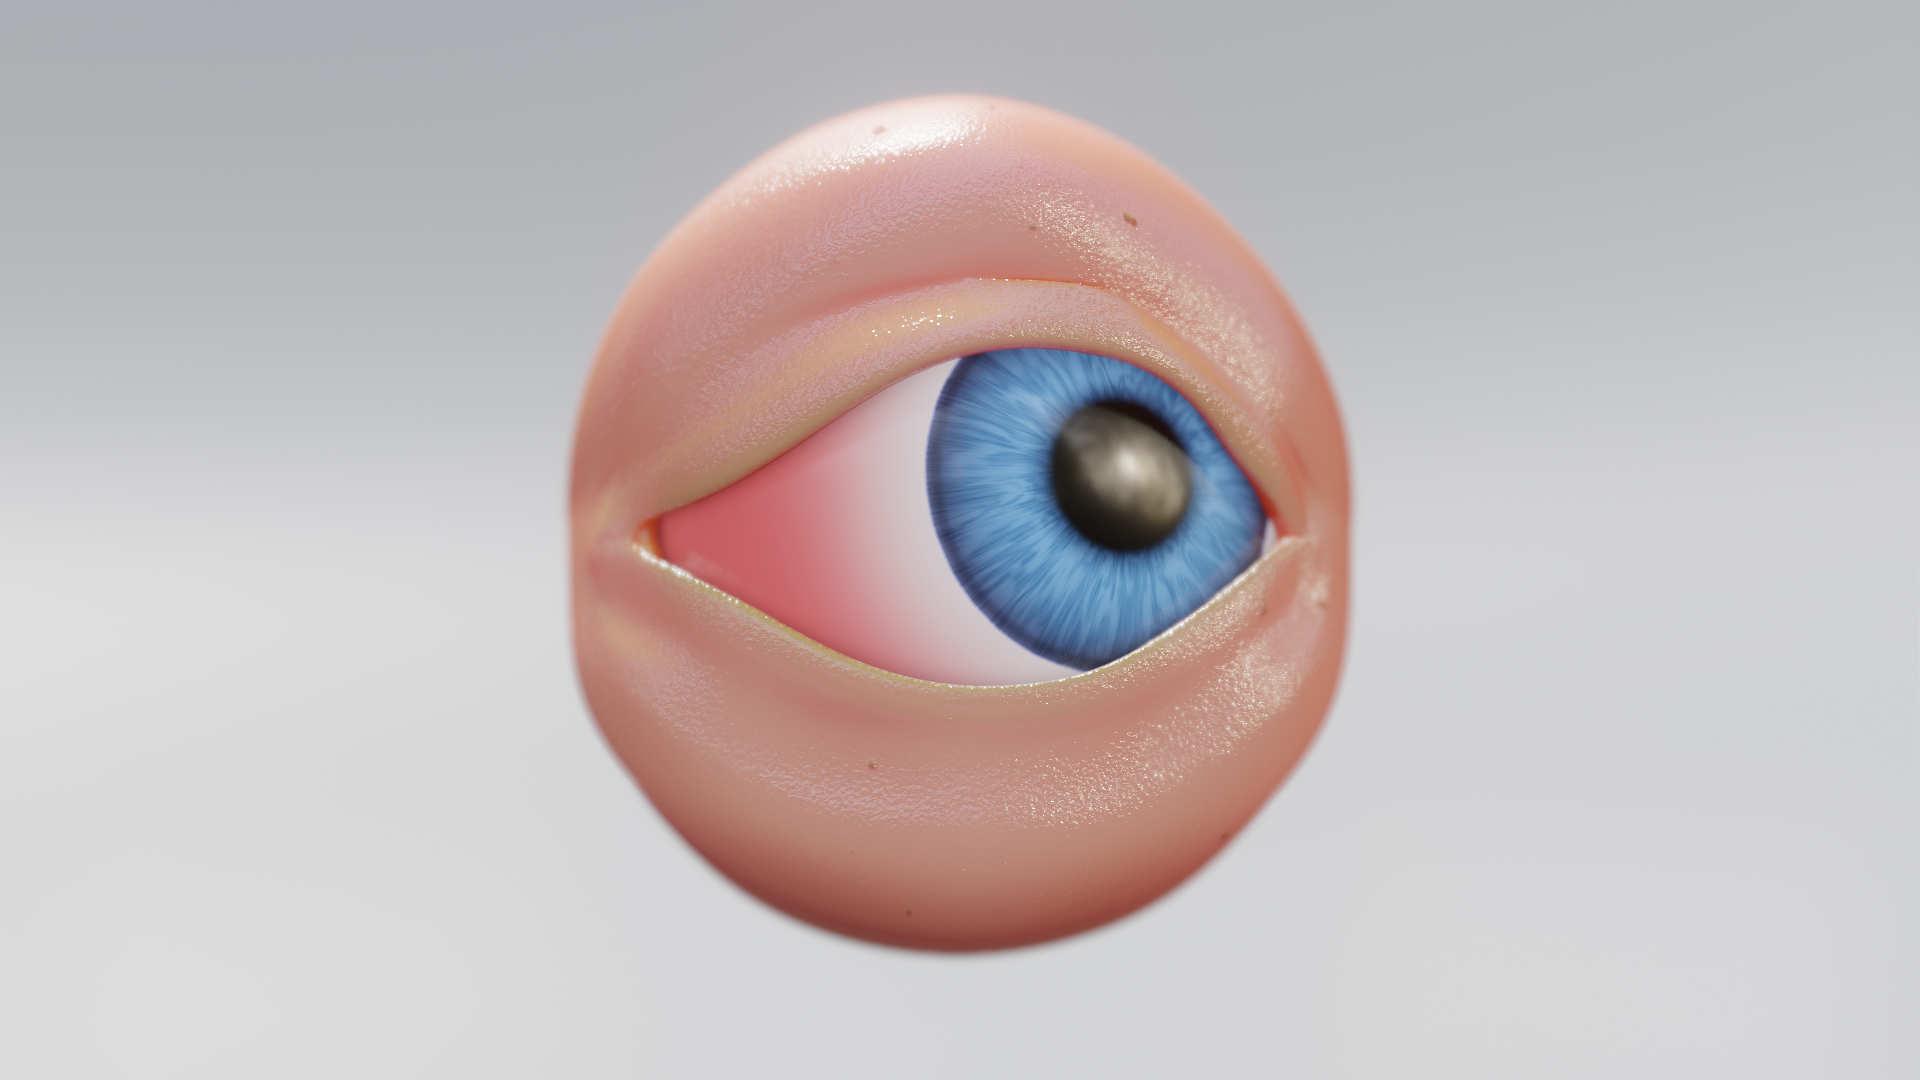 Eye_Procedural_002